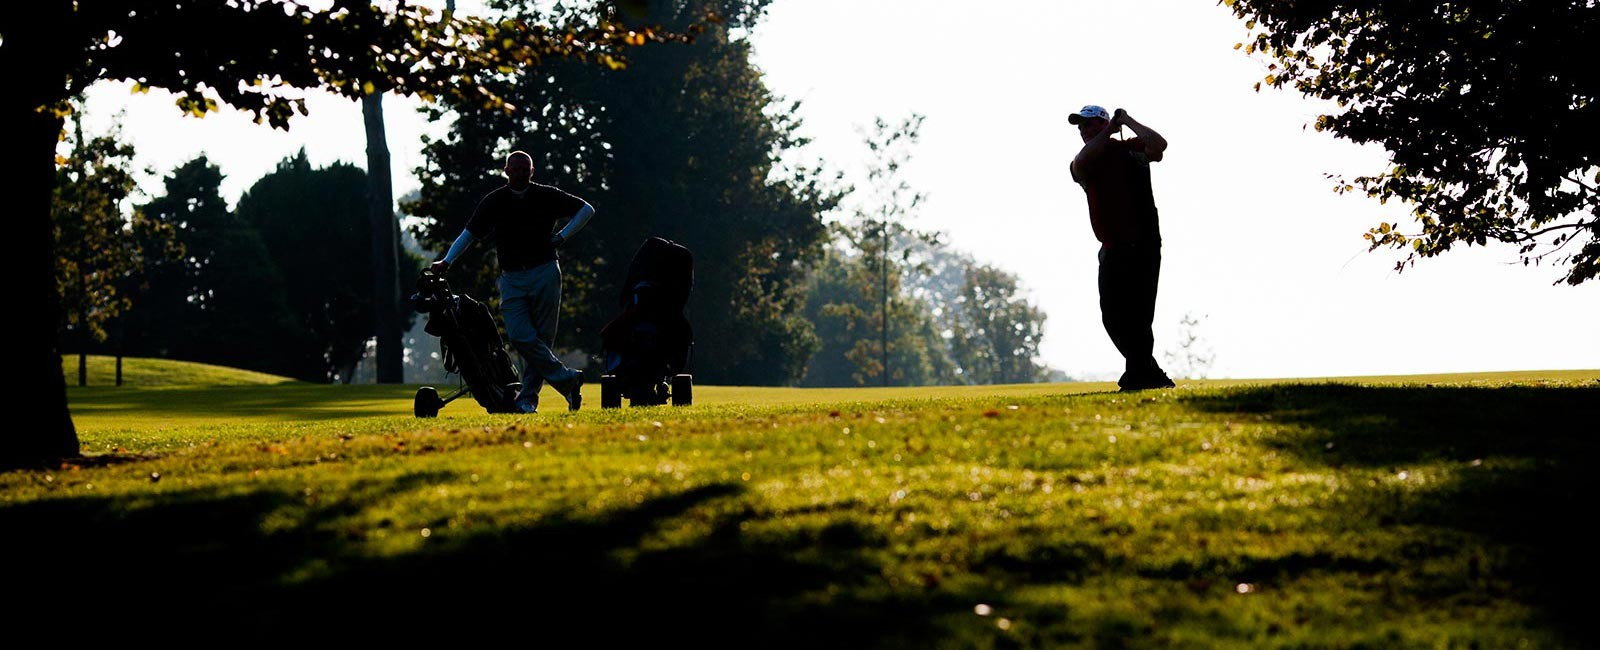 <p>Grab Your Clubs: 3 Great 5-Star Golf Getaways in Ireland<span></span></p>